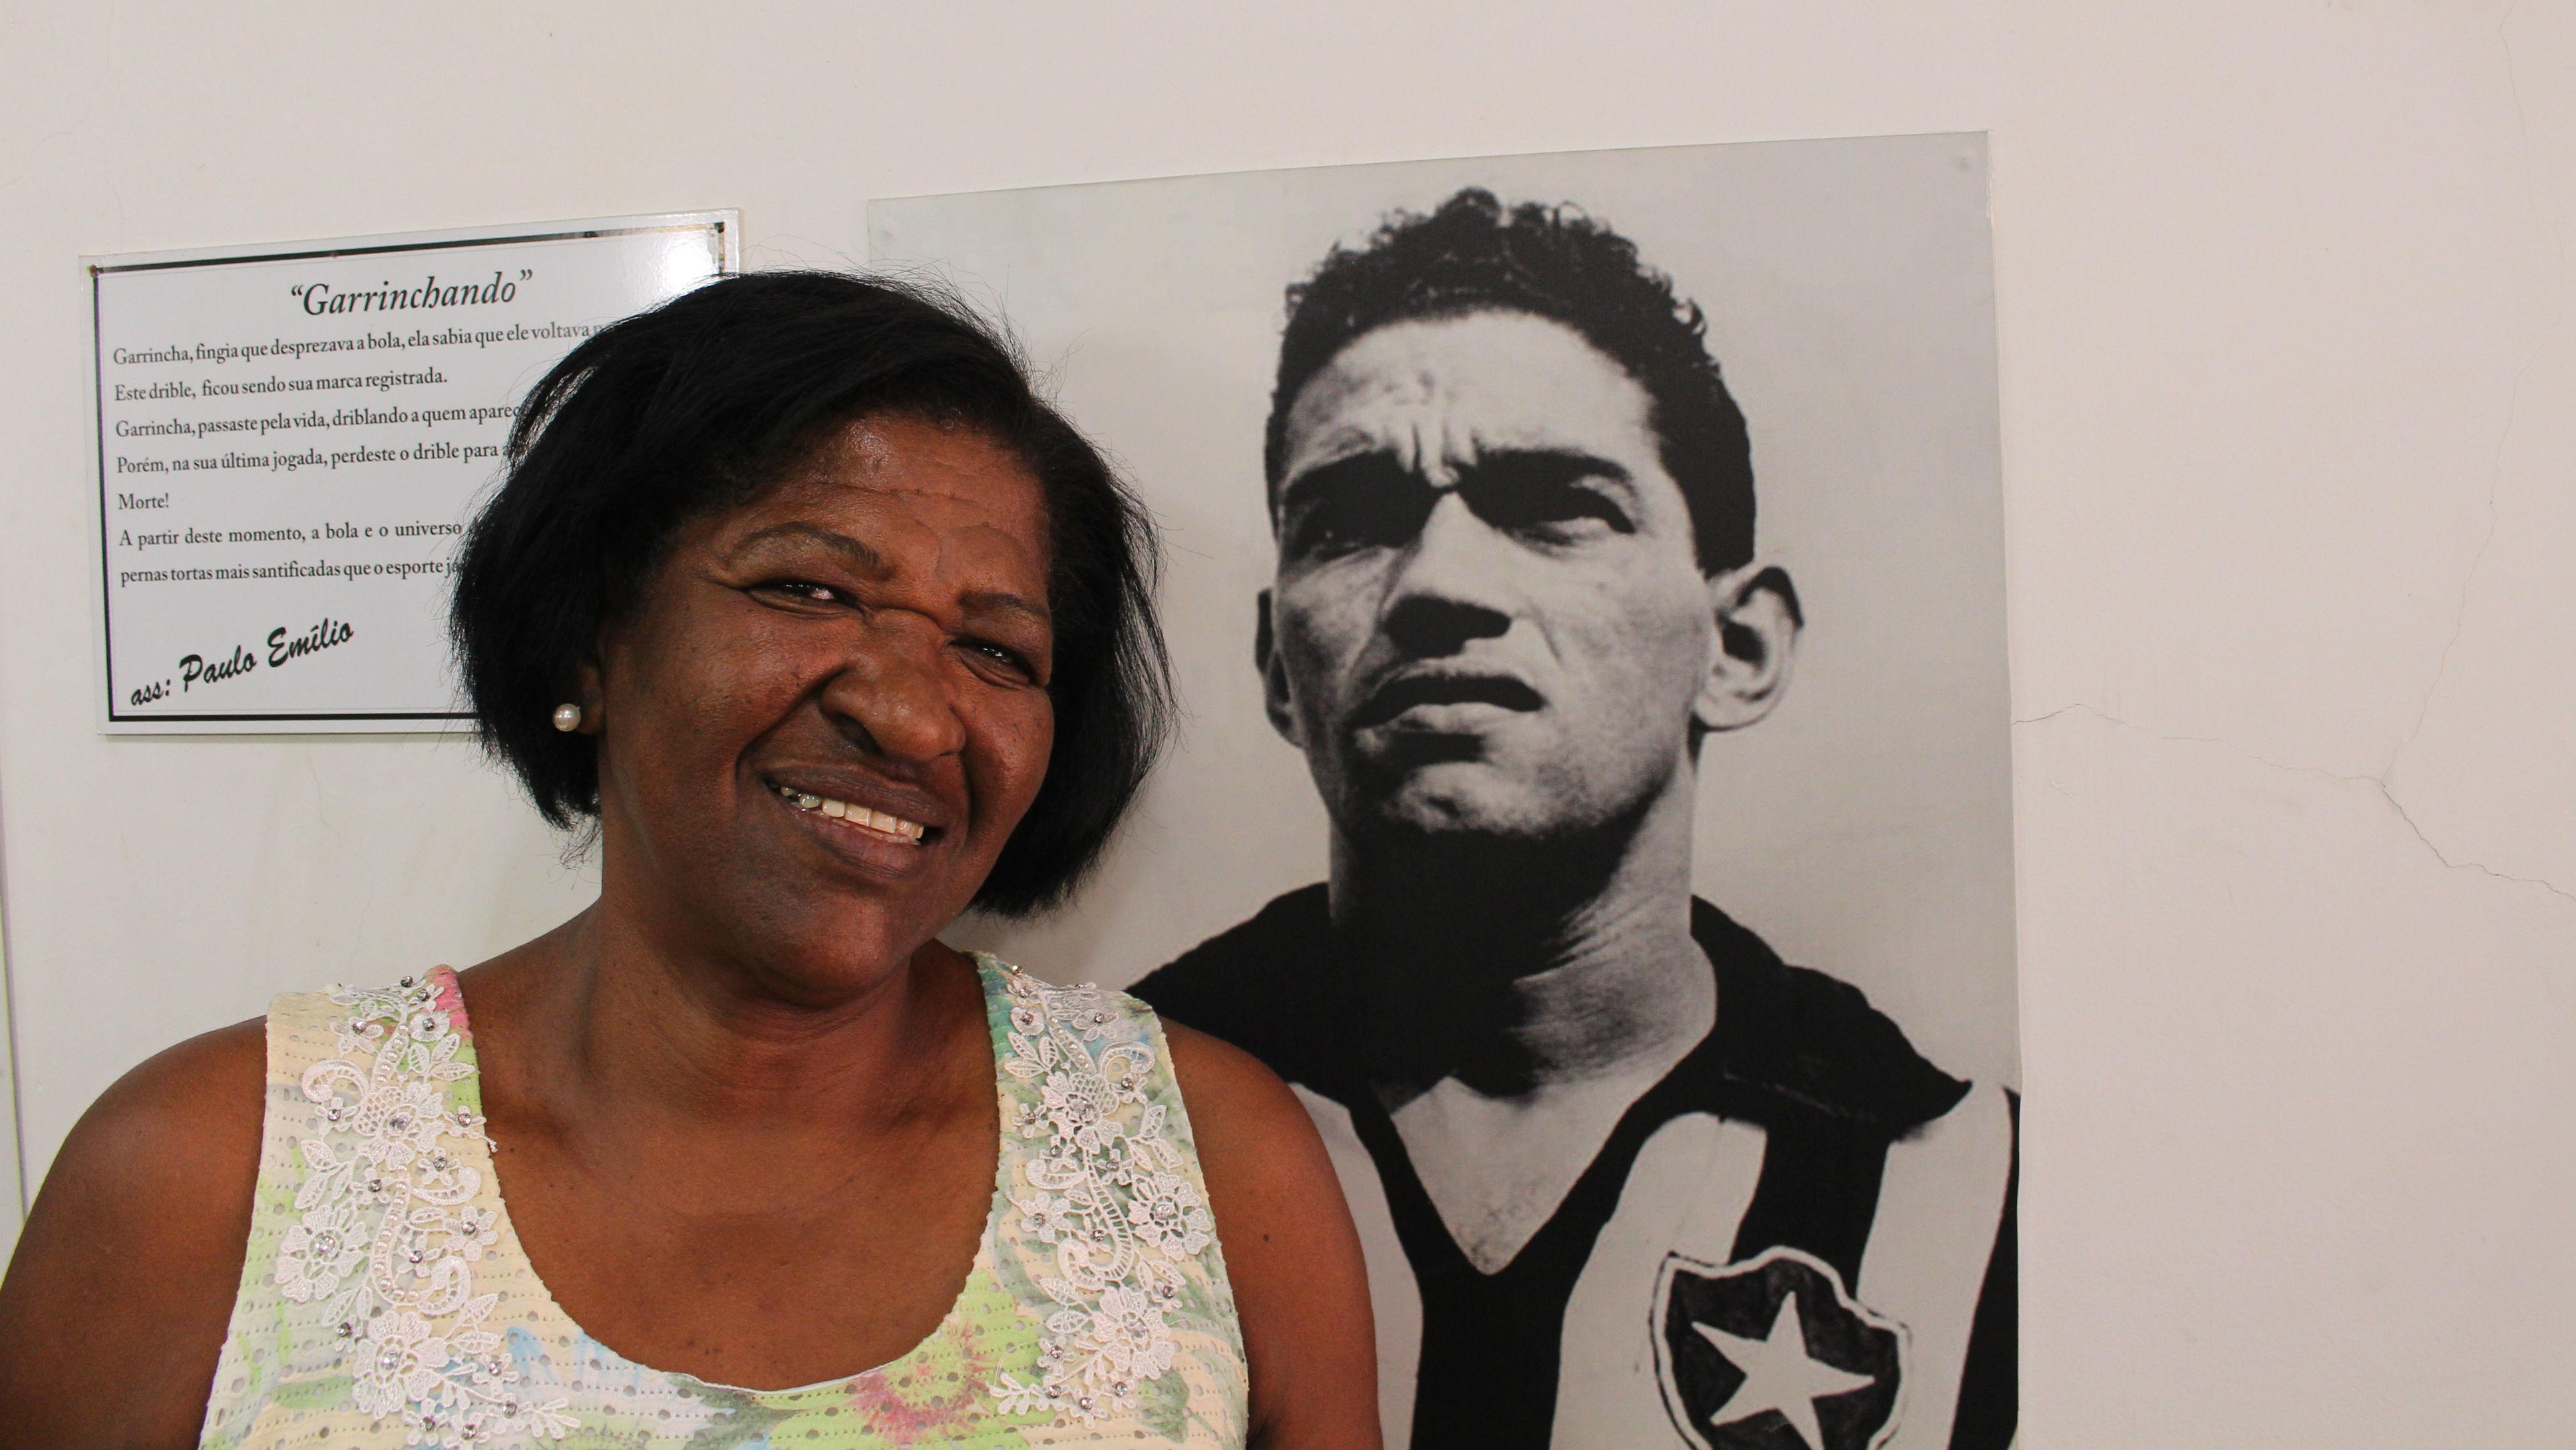 Pau Grande A place where Garrincha is gone but never forgotten